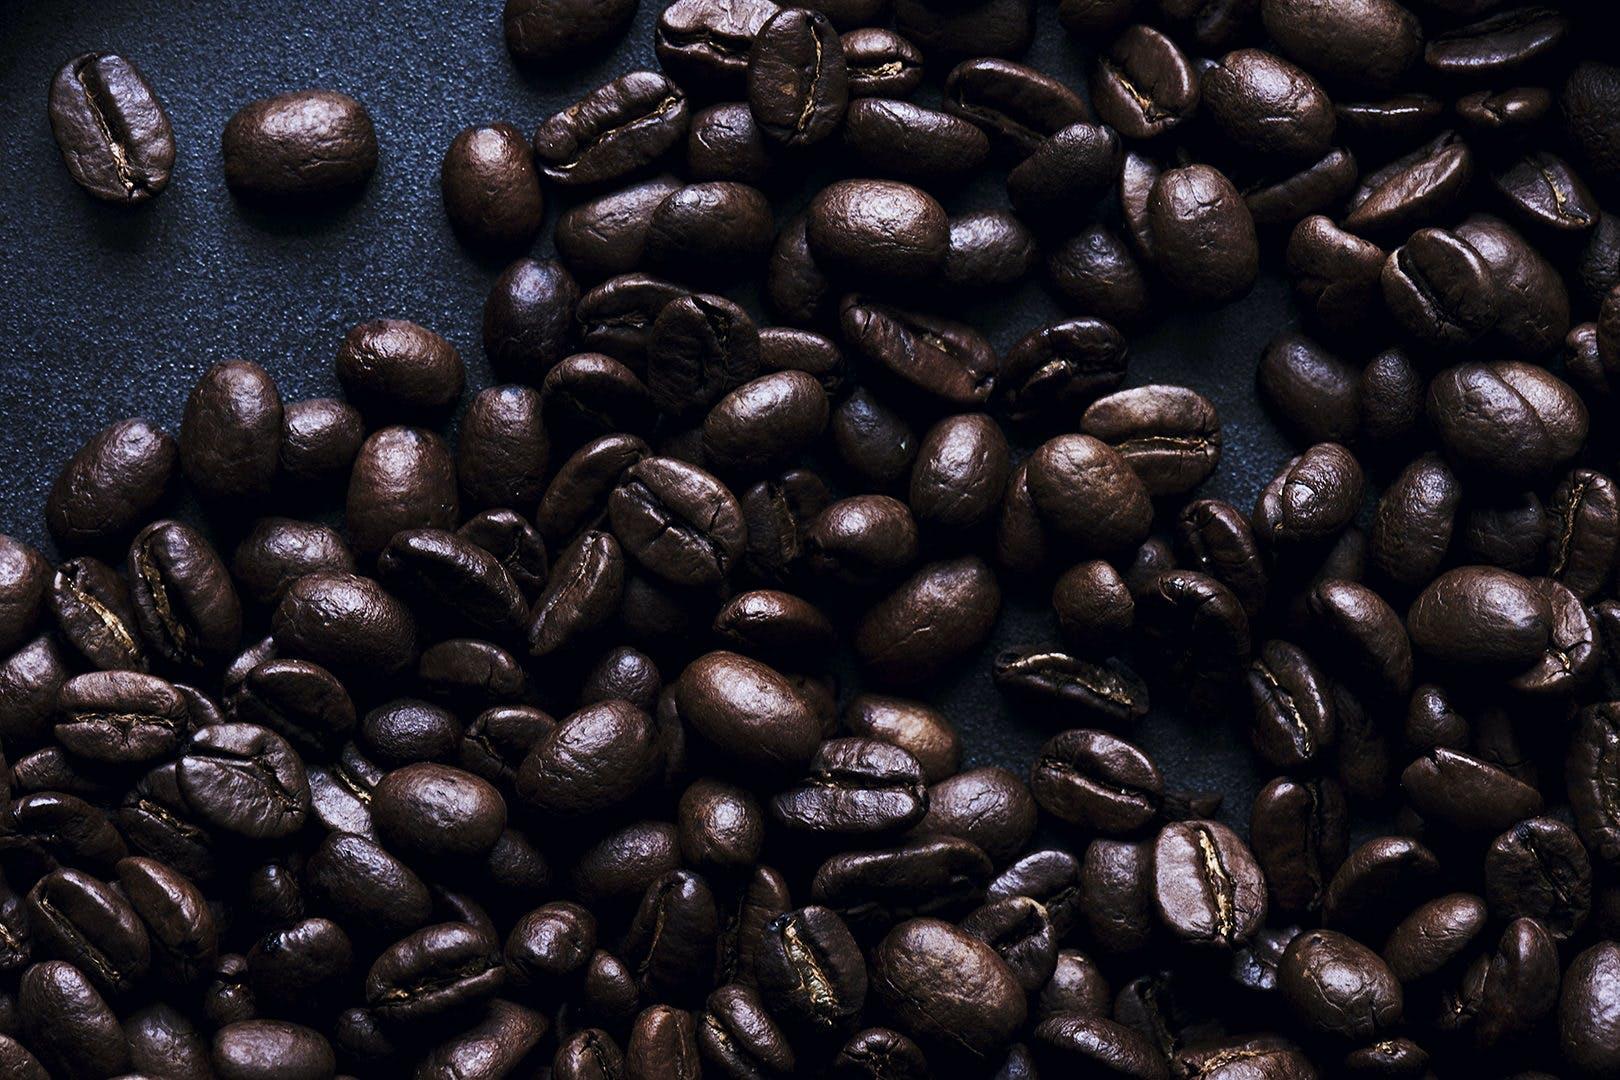 kaffe kaffekorn bønner